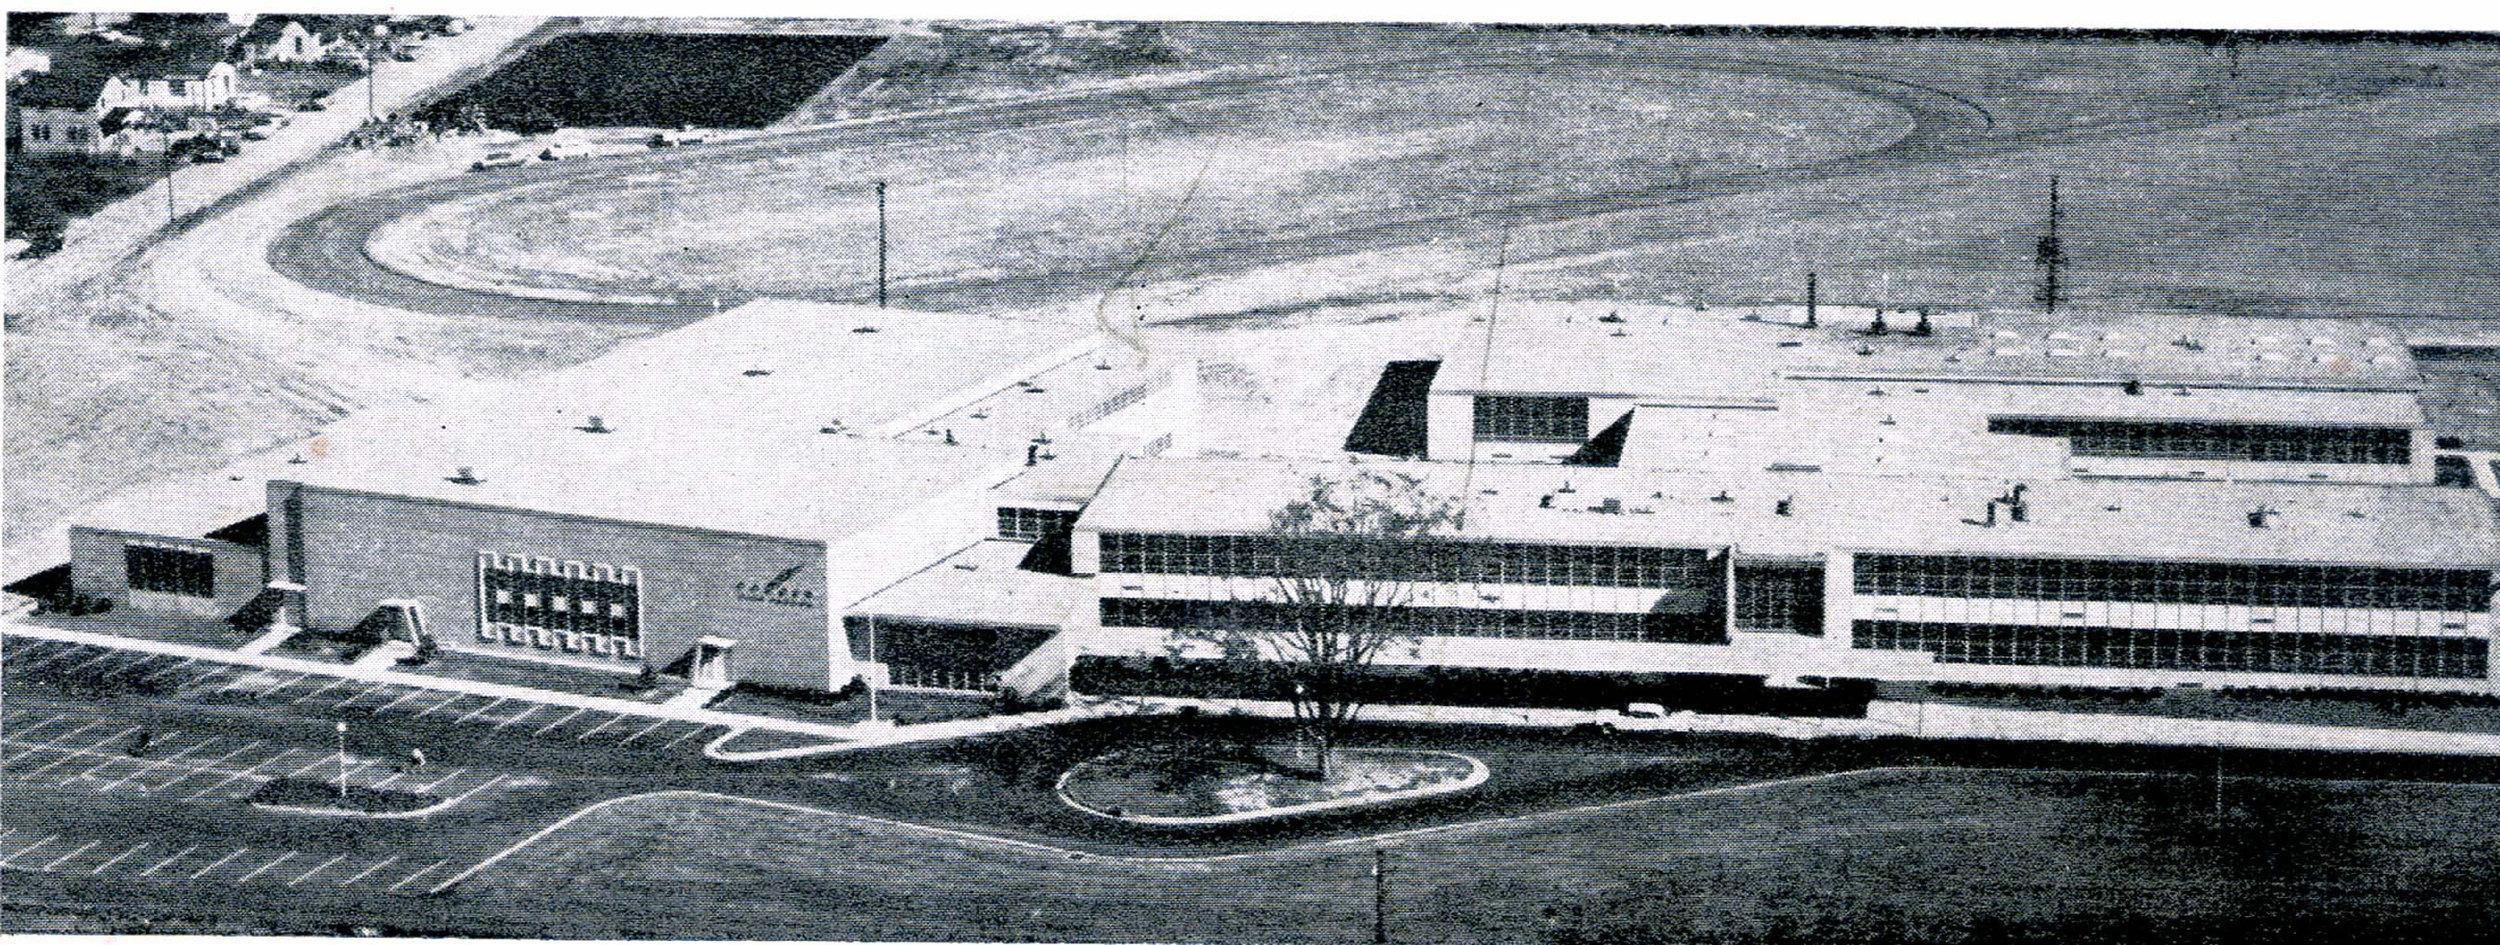 Phenix High School at LaSalle Avenue